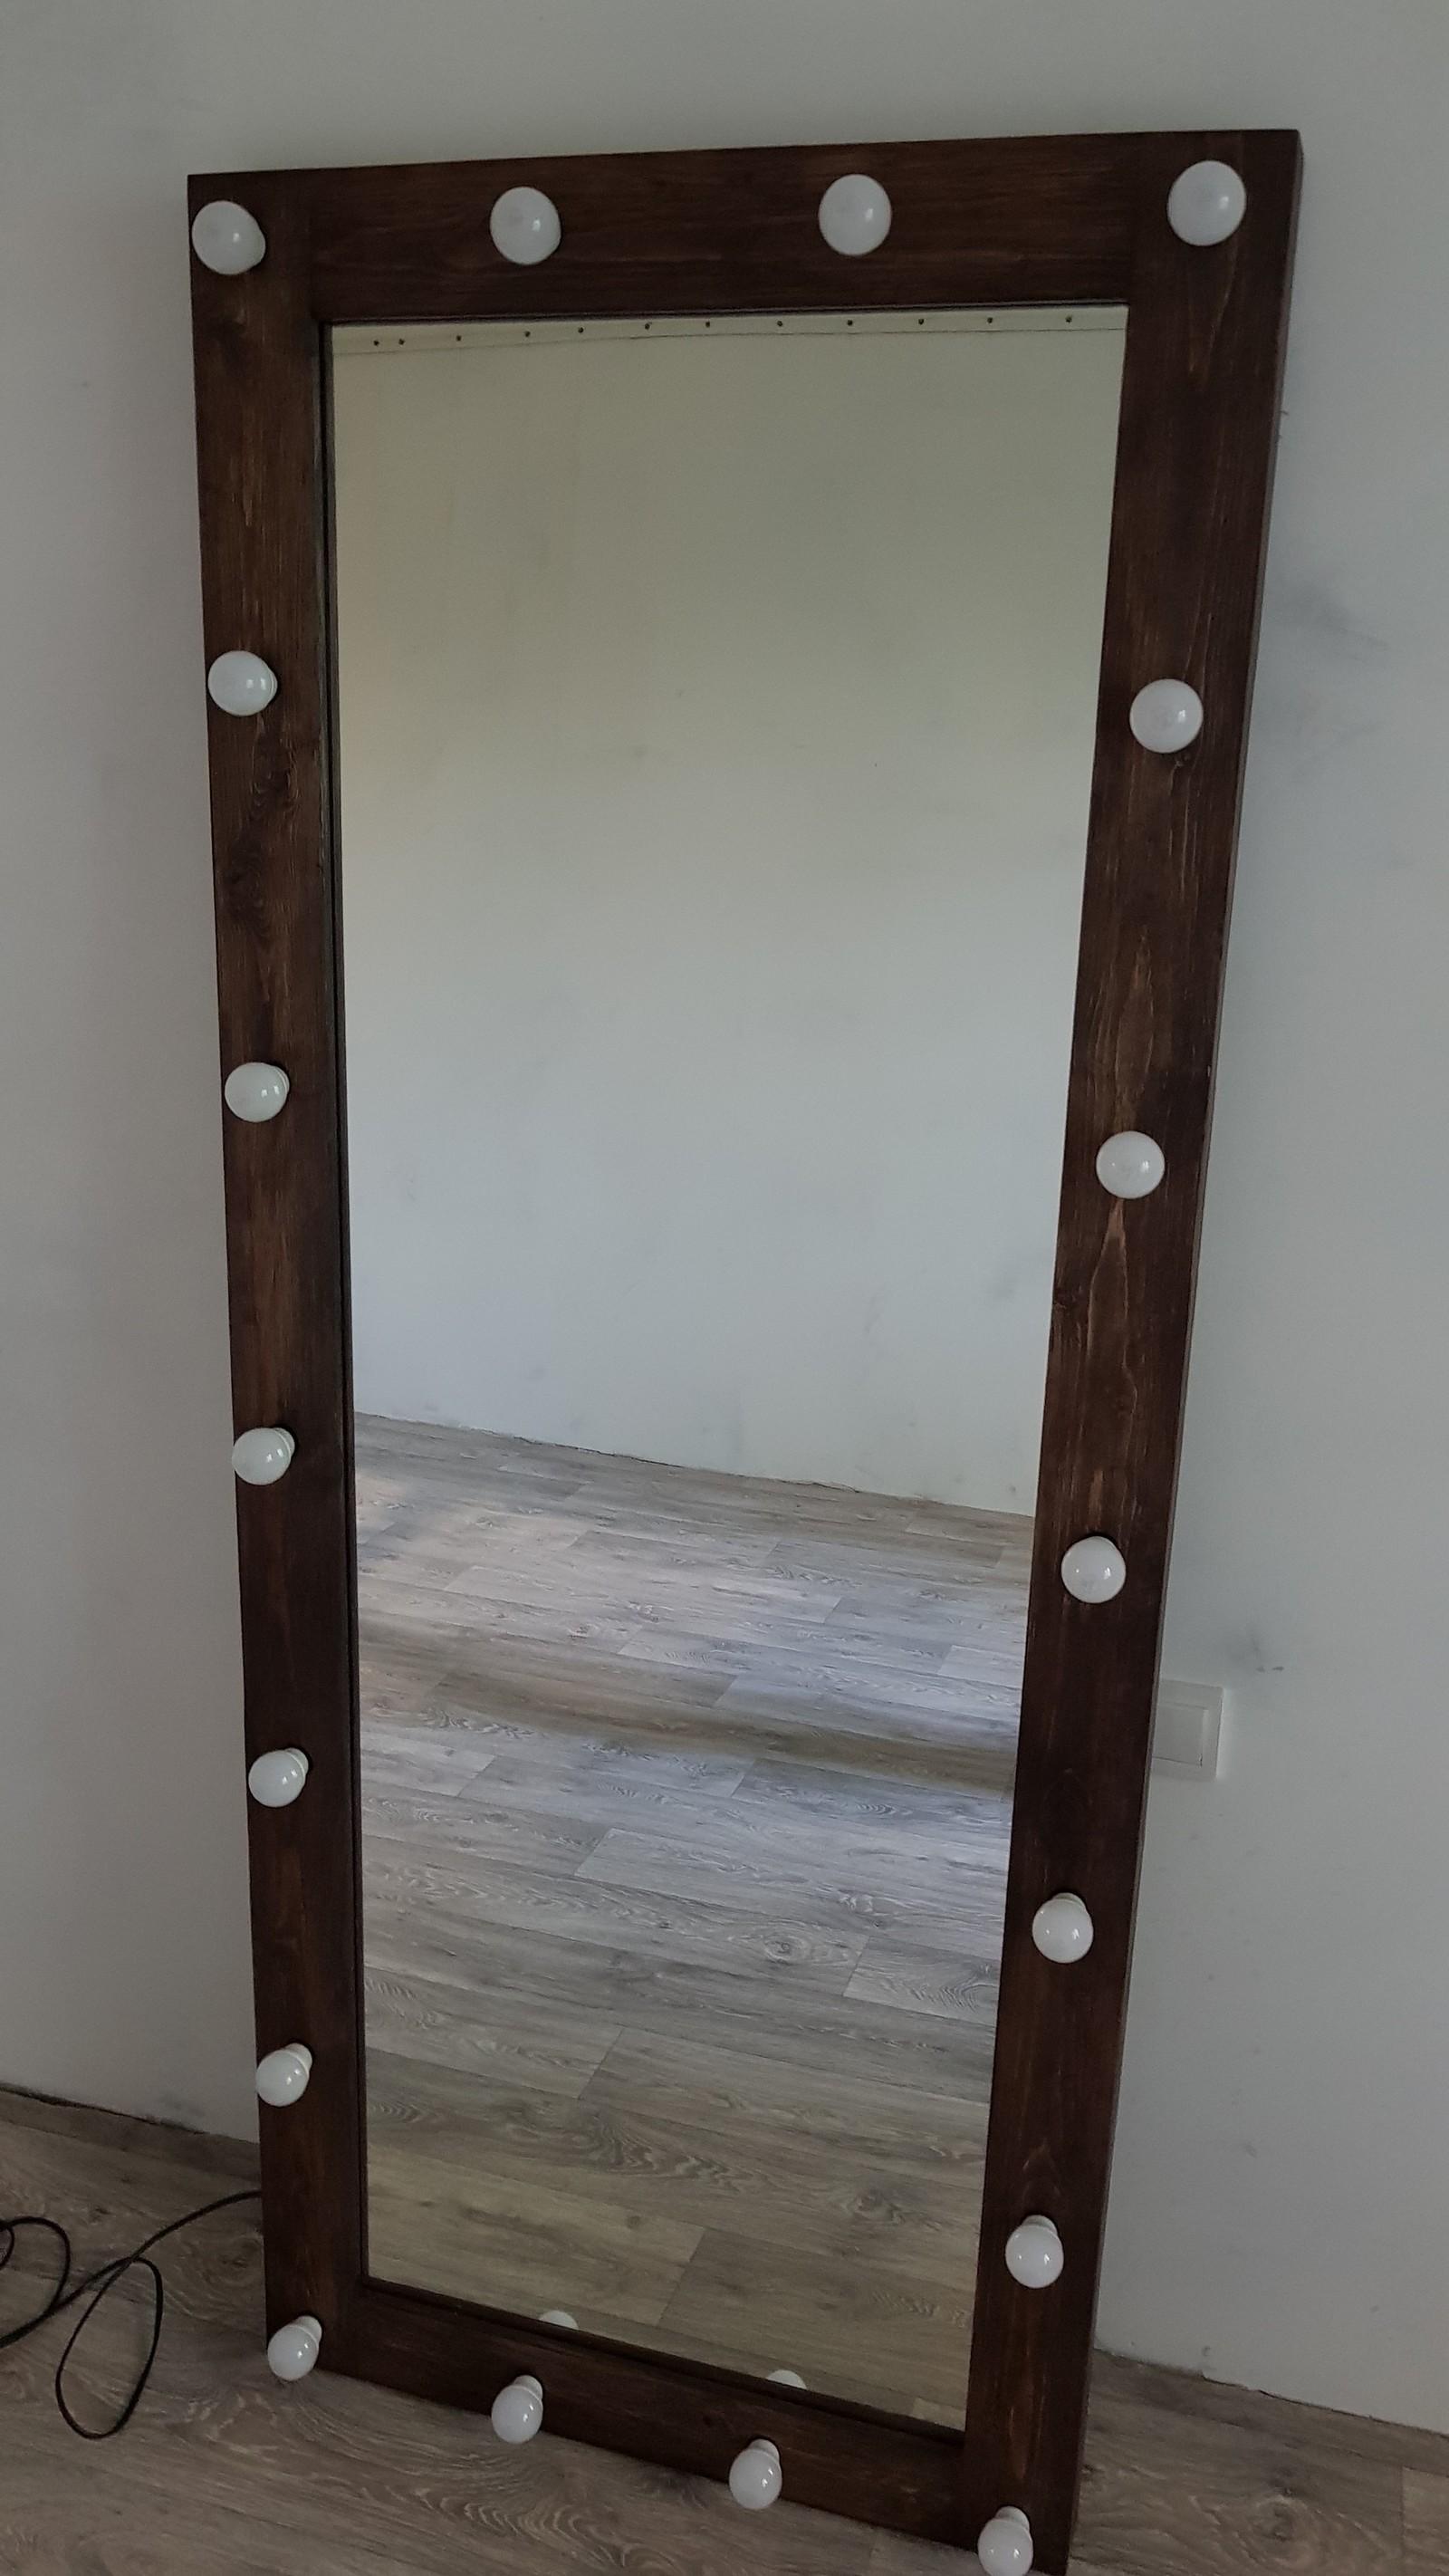 Зеркало во весь рост своими руками фото 952